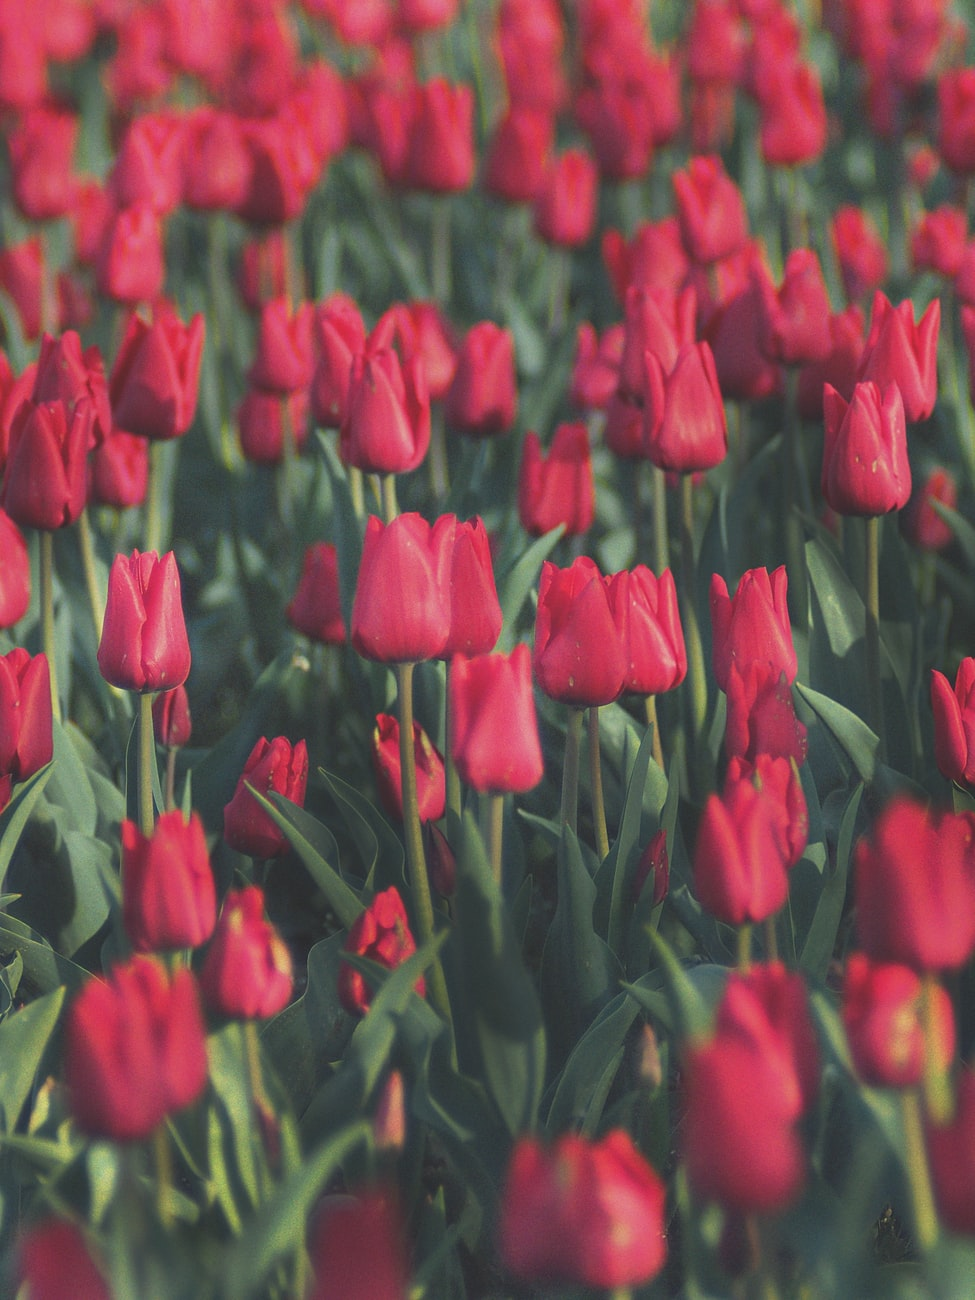 tulips in Holland, Michigan